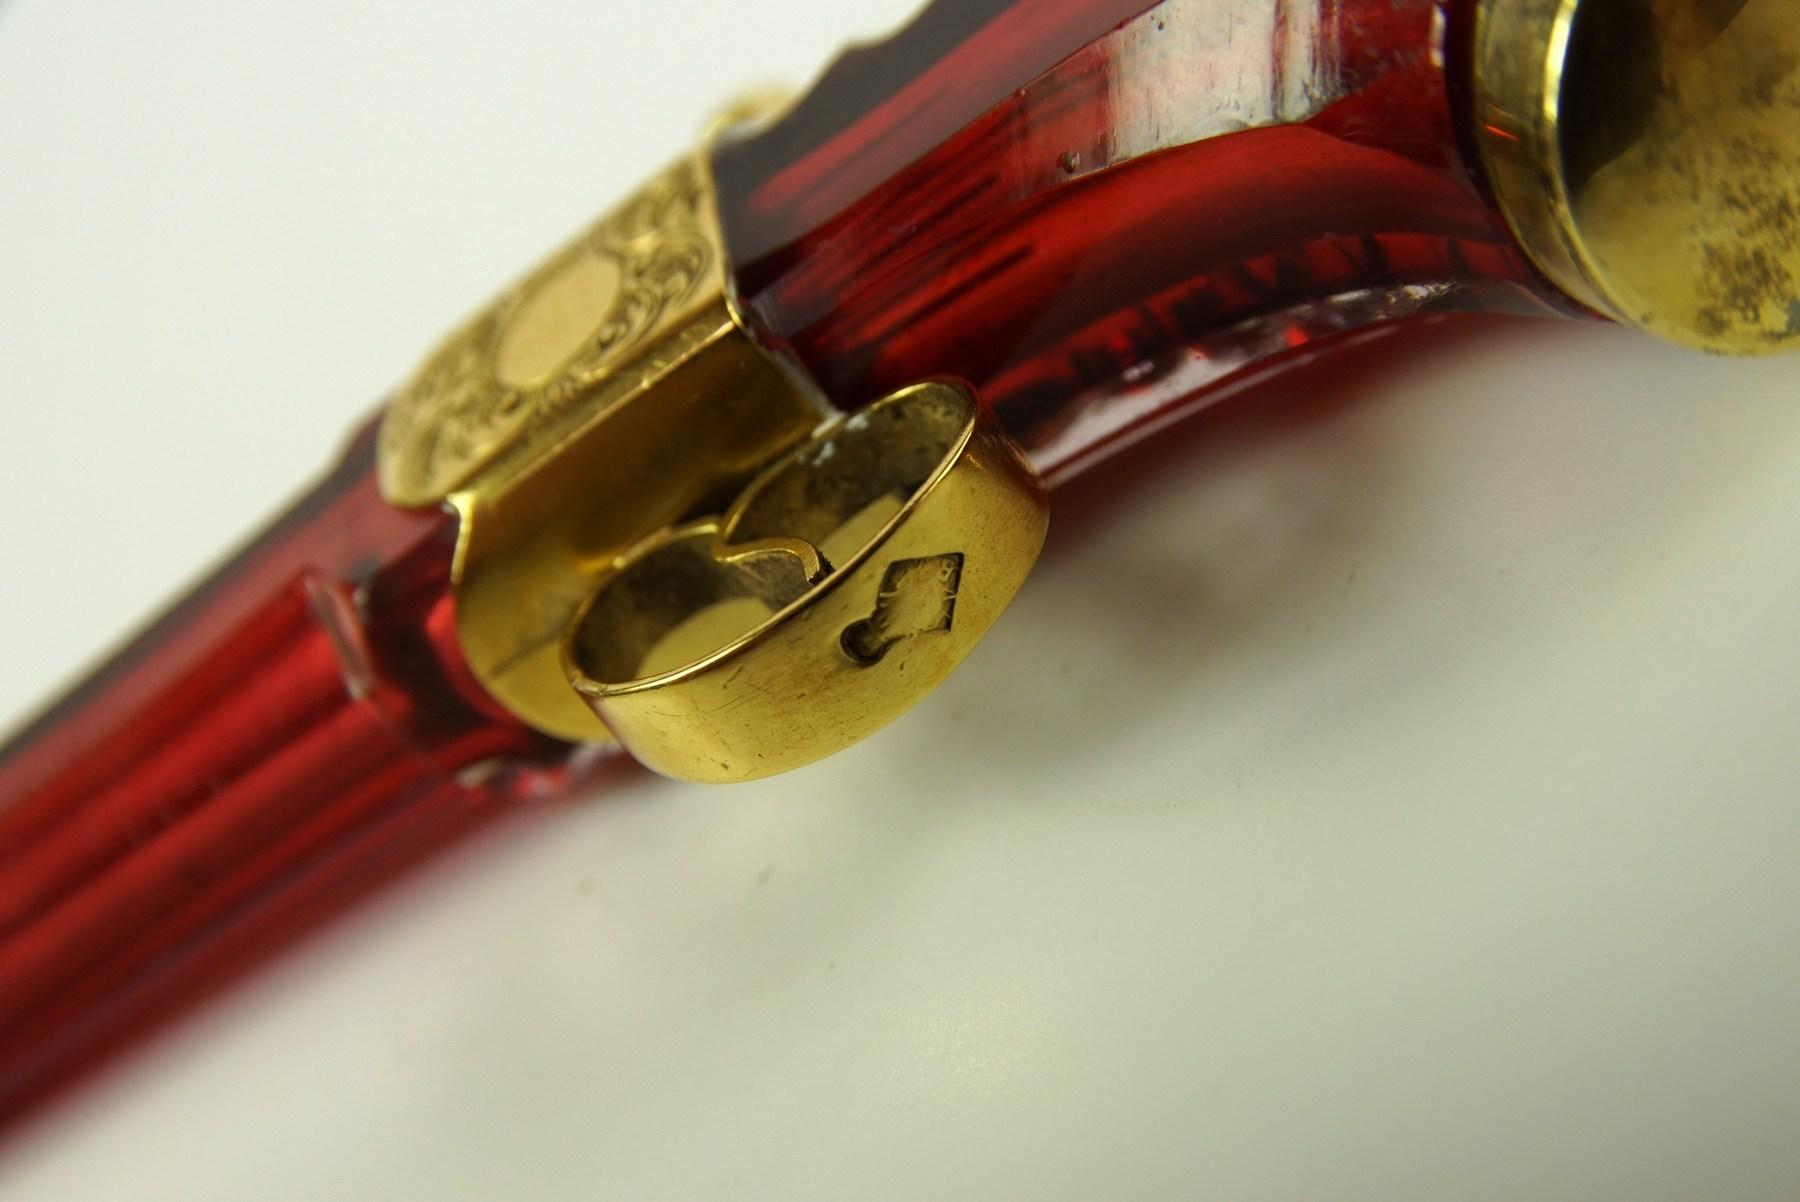 A fine cranberry glass gun shaped perfume bottle - The